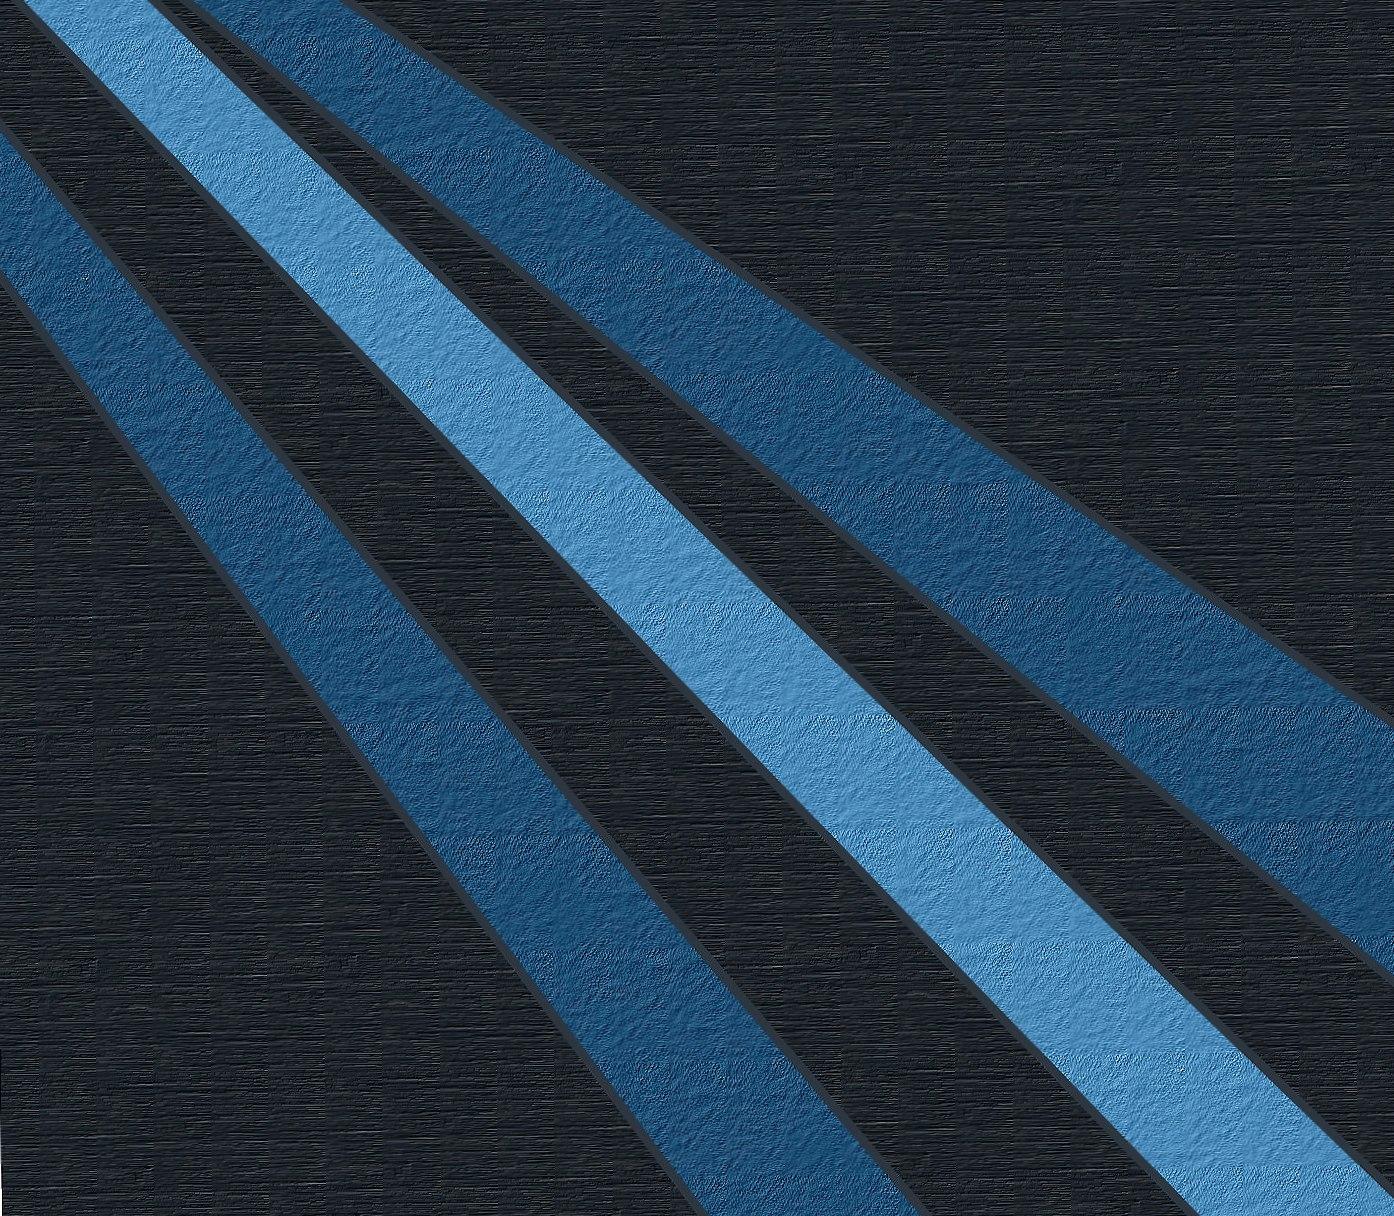 HQ Blue Art Screen wallpapers HD quality